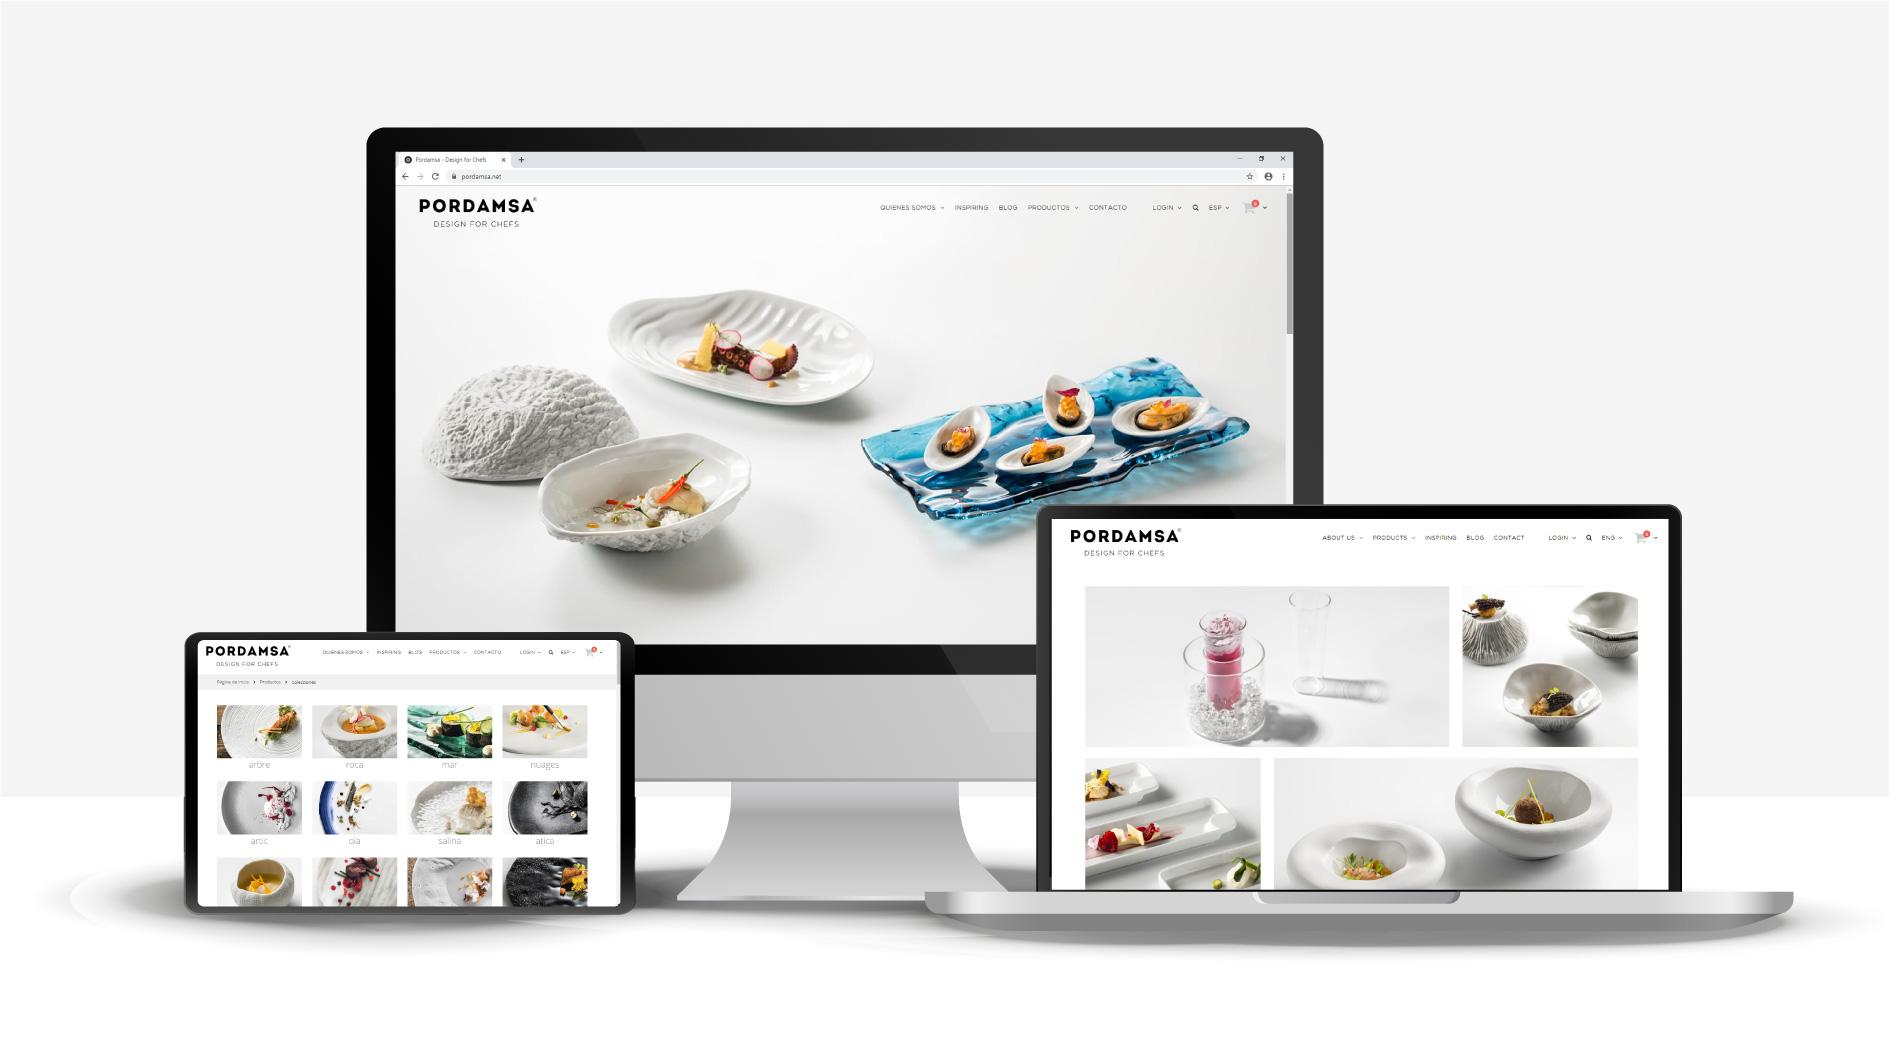 Nueva web de Pordamsa - Pordamsa